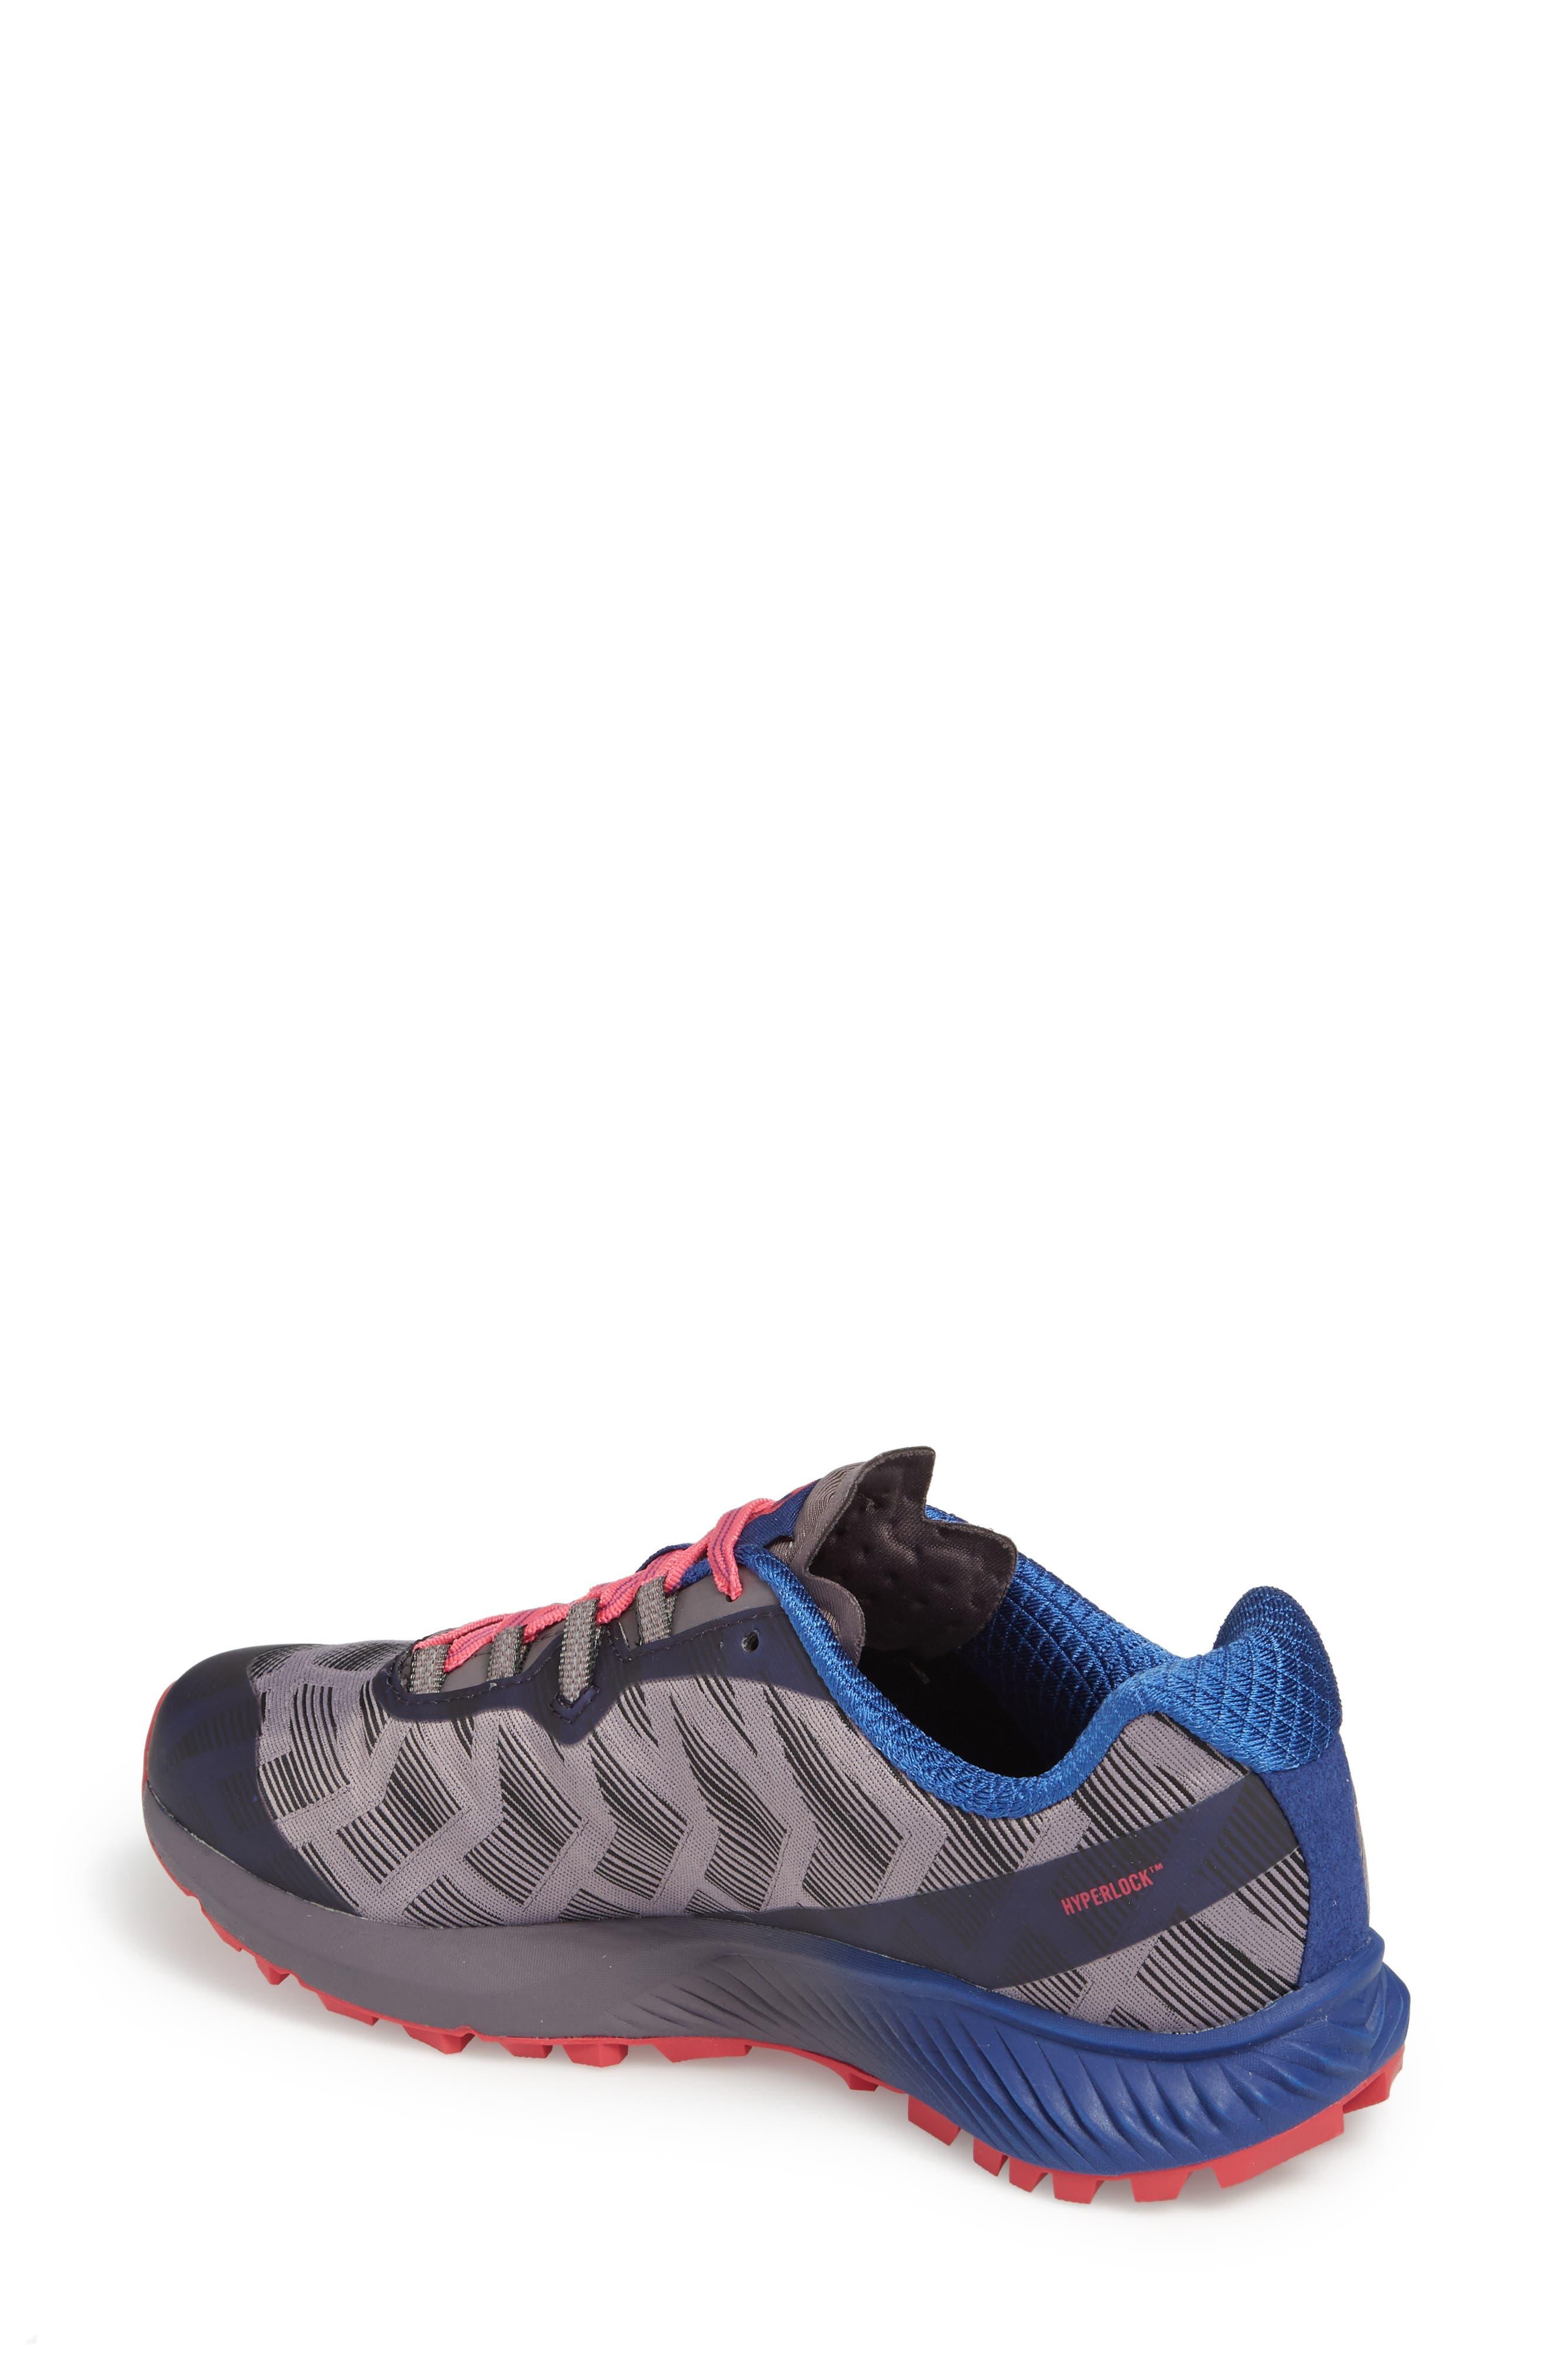 Agility Synthesis Flex Sneaker,                             Alternate thumbnail 2, color,                             SHARK FABRIC